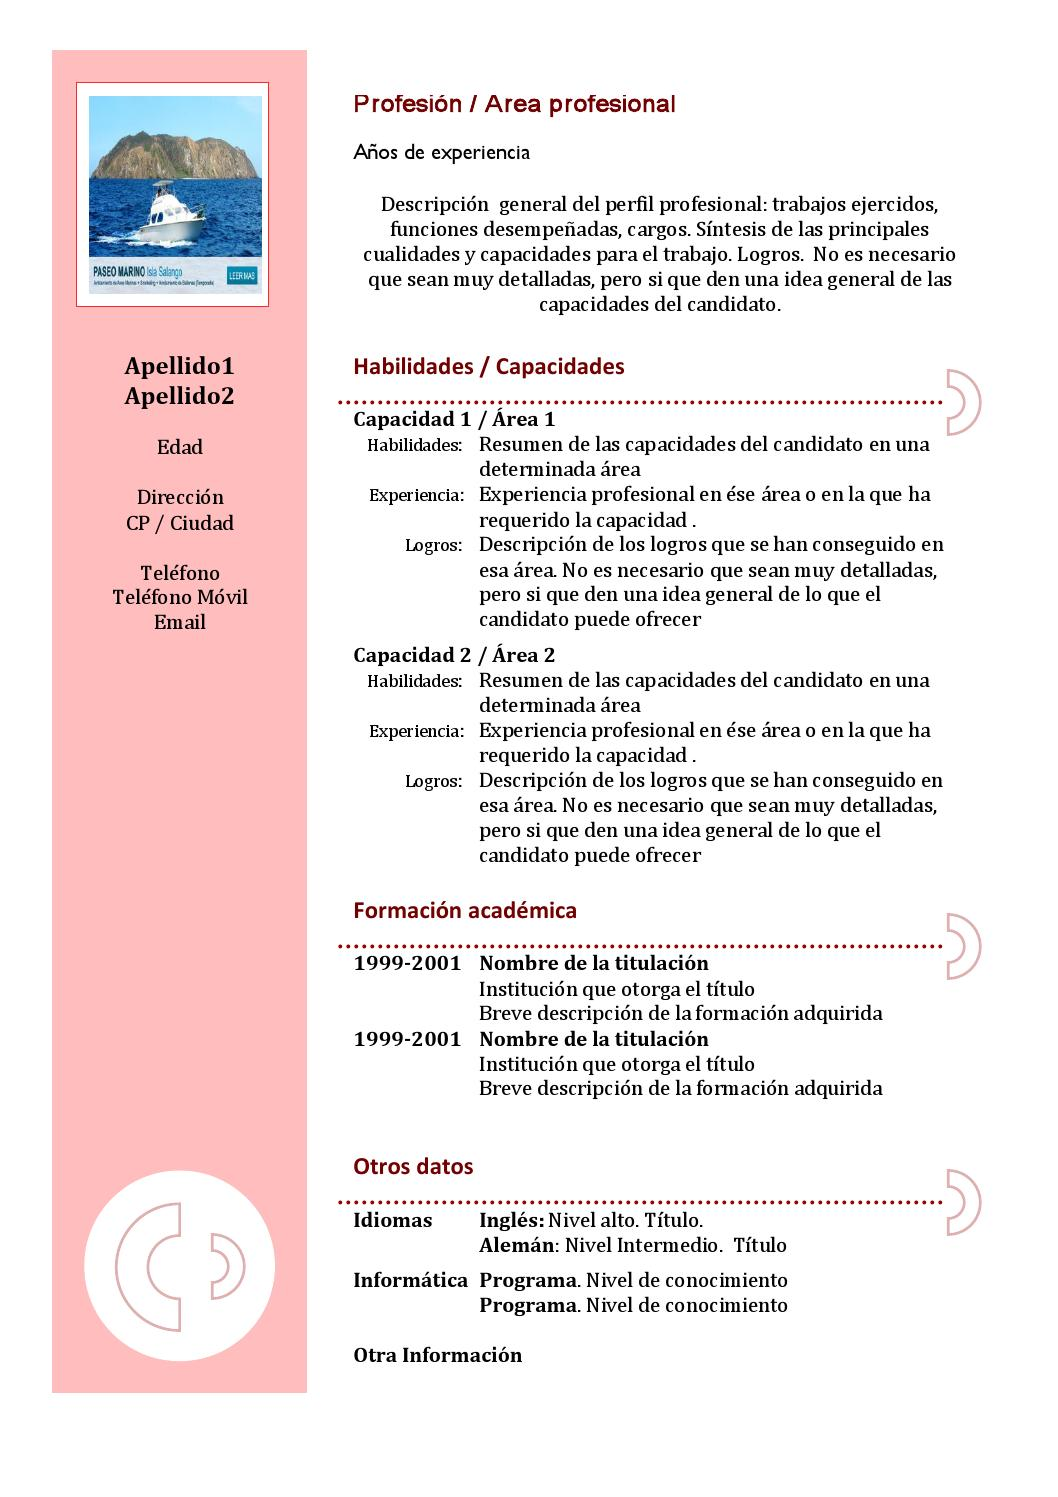 Curriculum vitae by Jean Pierre Villafuerte - issuu